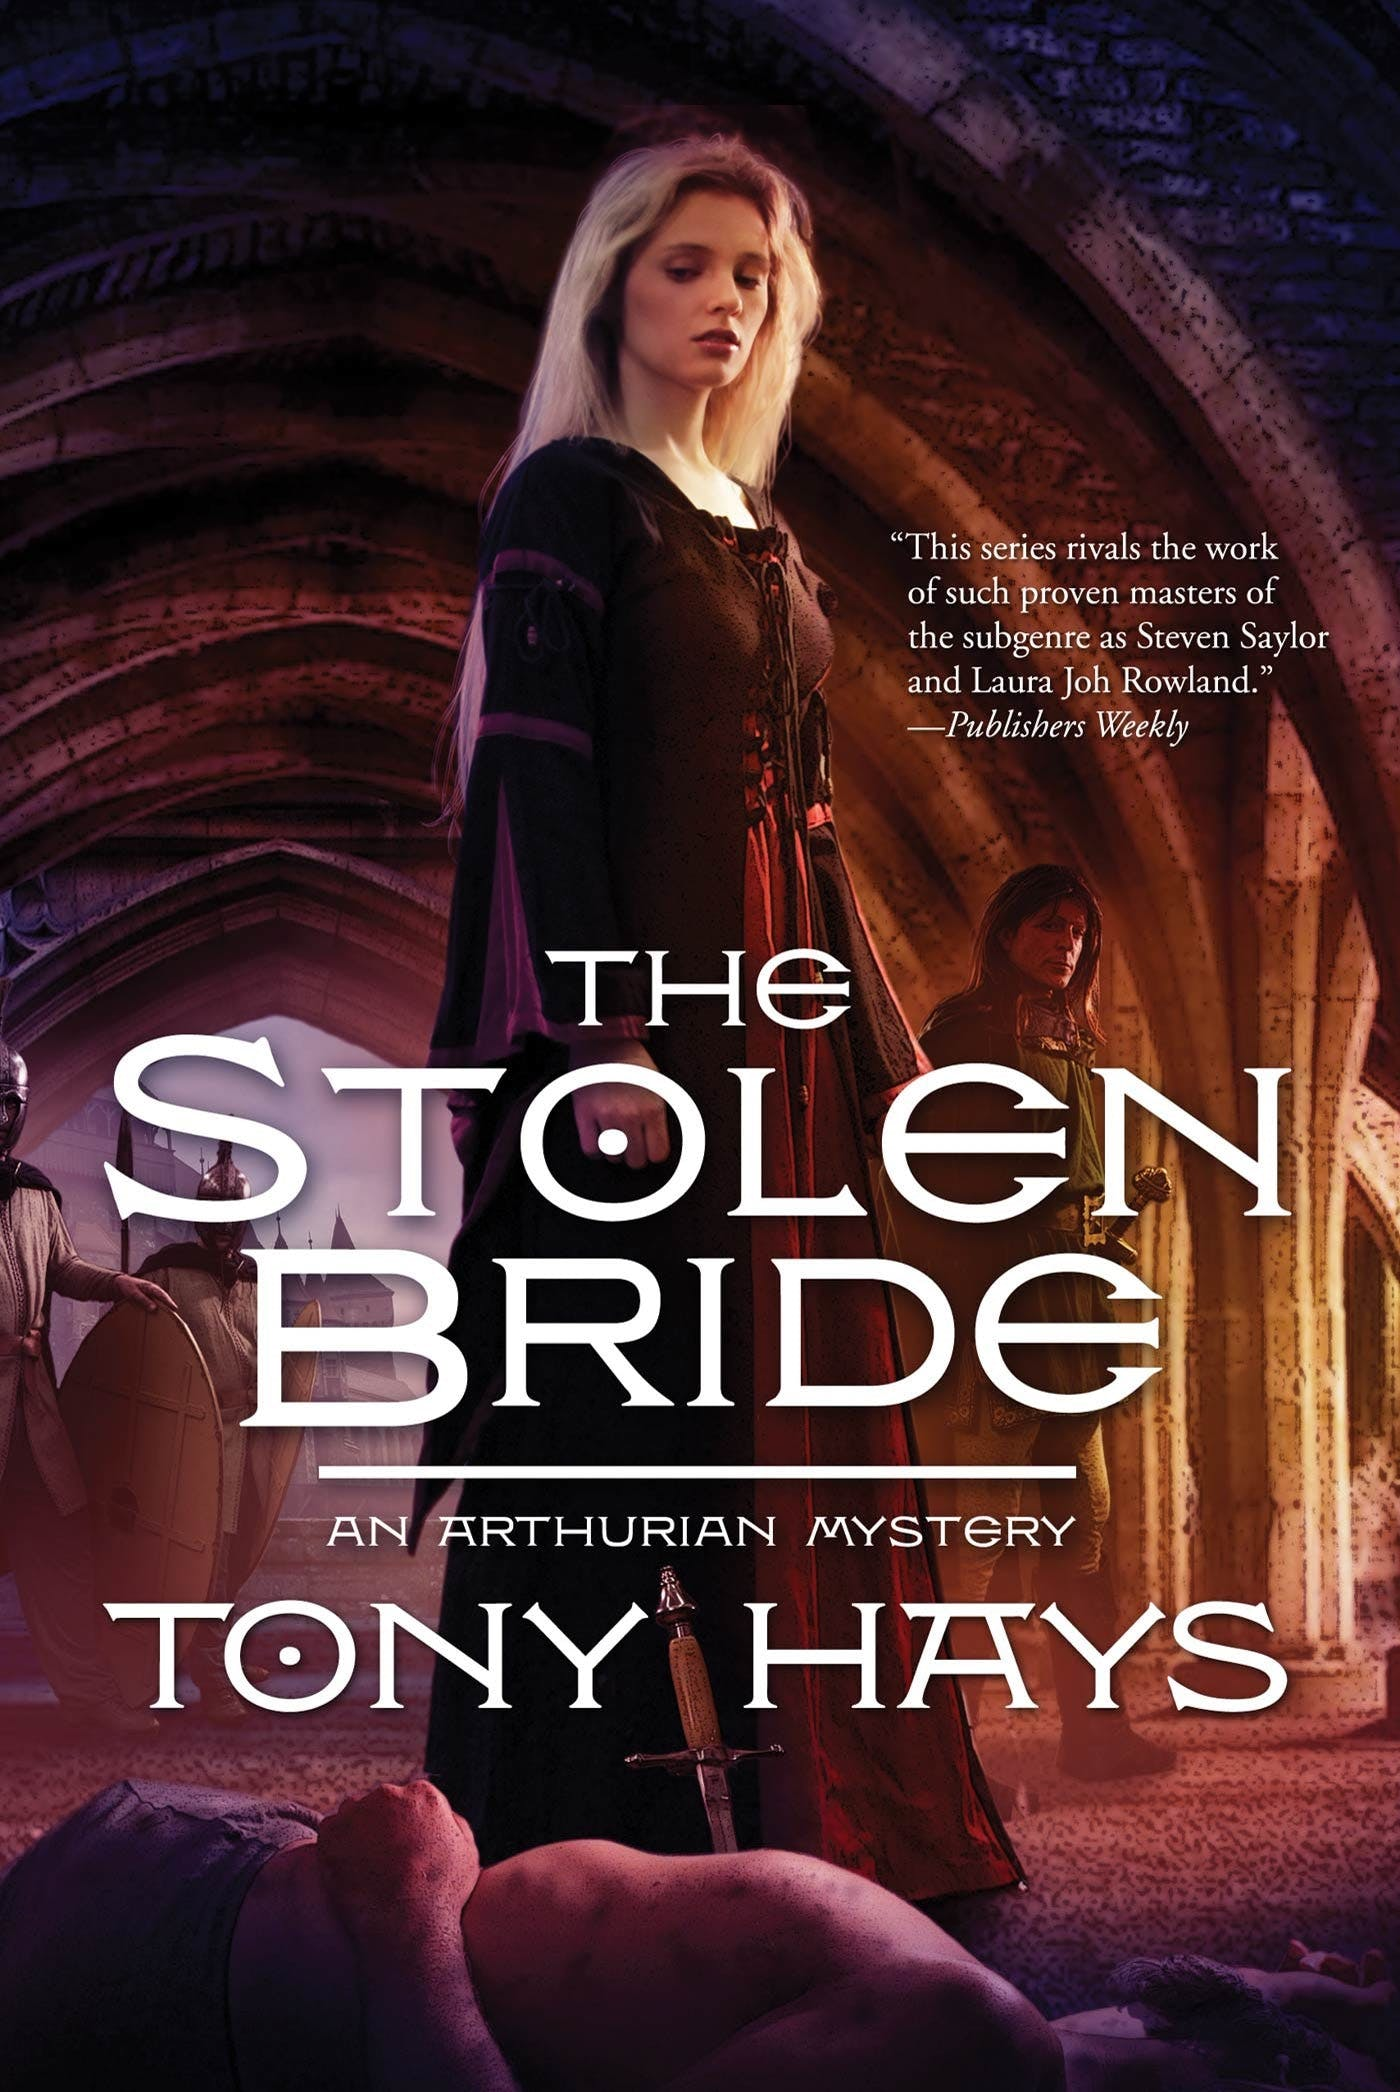 Image of The Stolen Bride